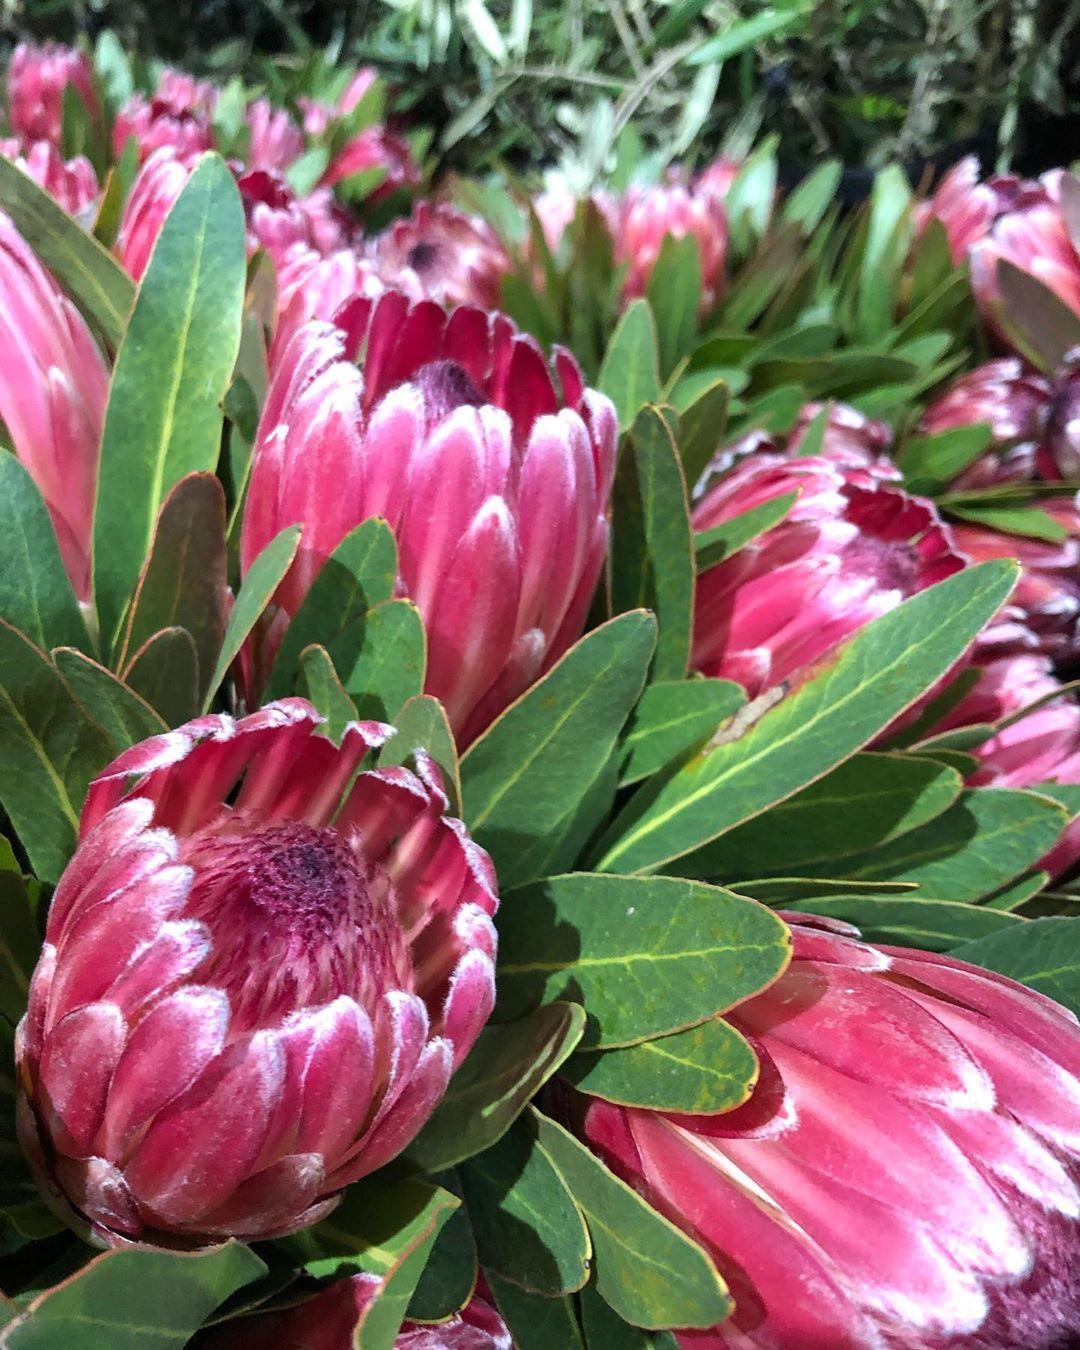 Geelong Flower Farm On Instagram Thomas White Leopard Pink Ice Protea Flower Farm Flowers White Leopard